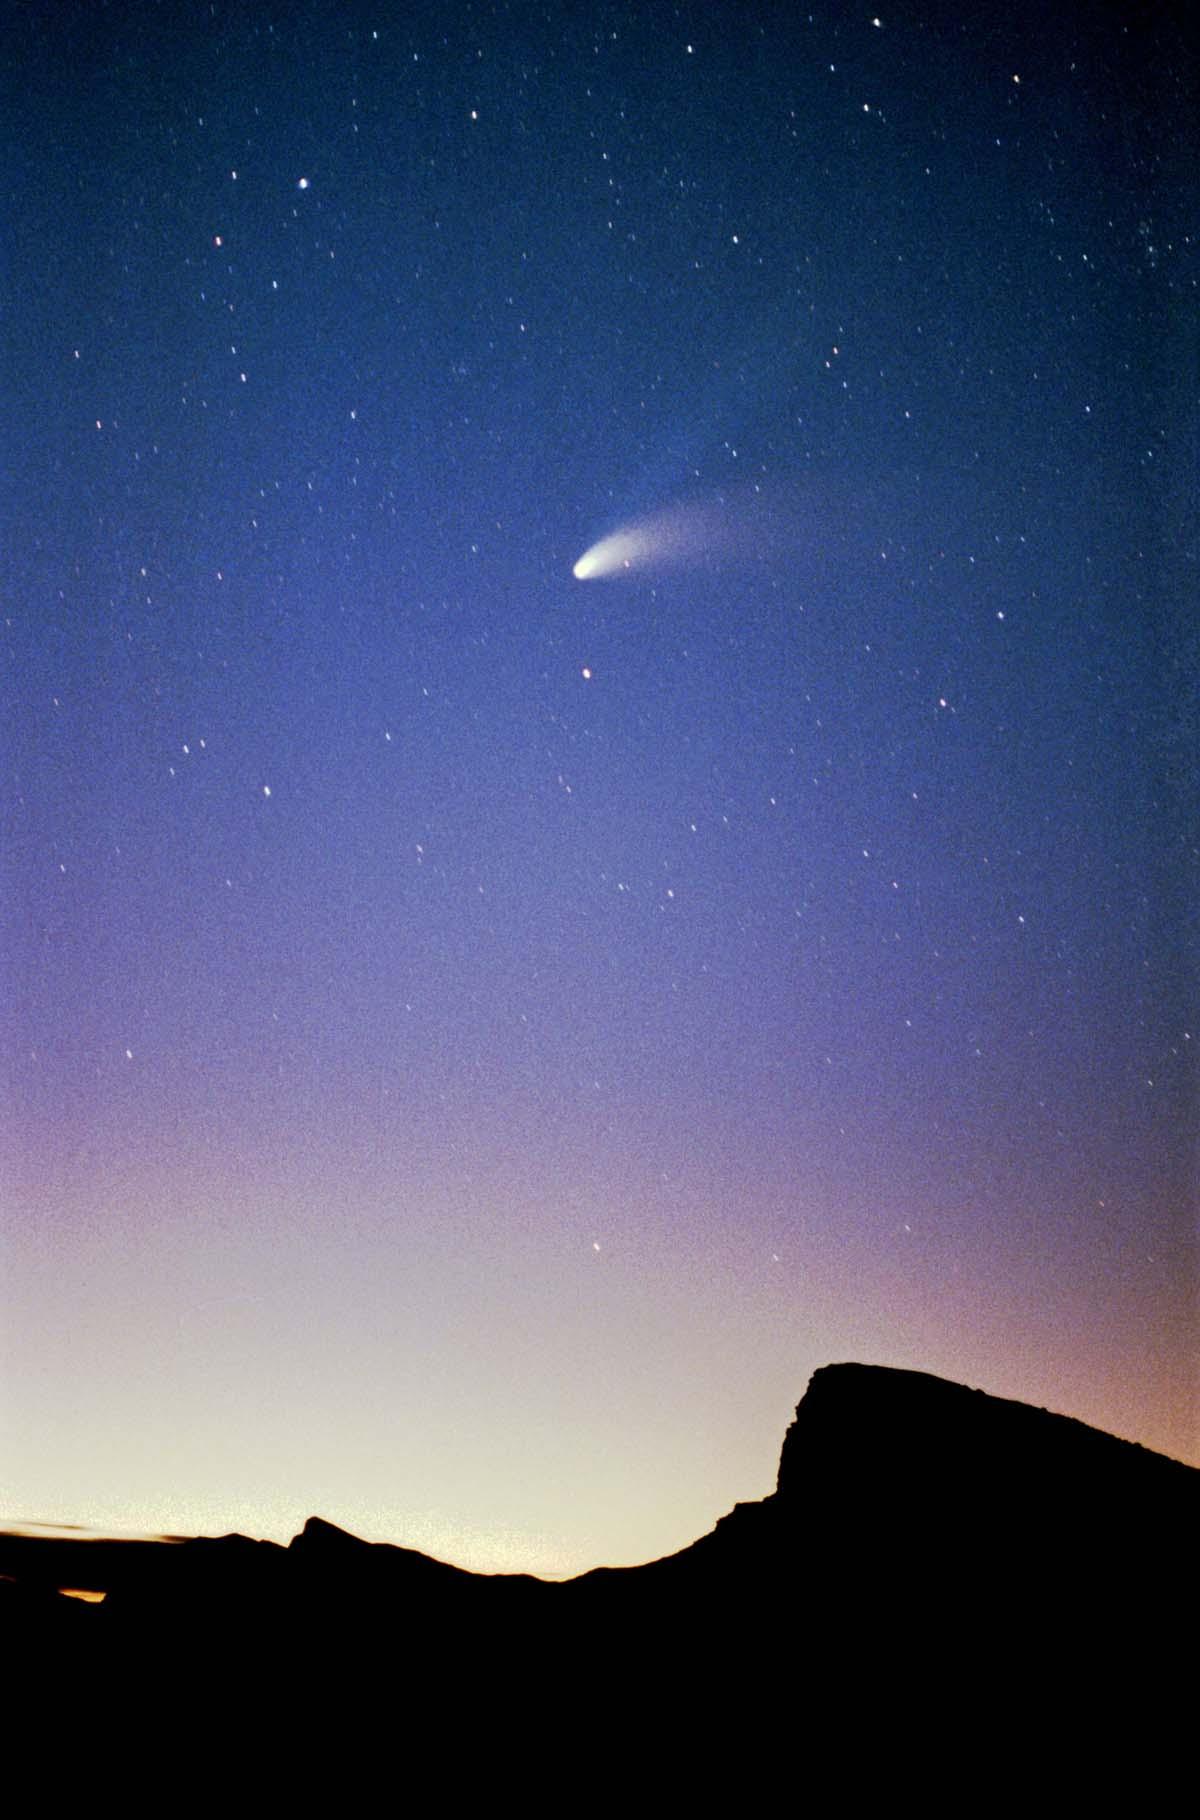 Comet Hale-Bopp. Alex Krainov shot this image at Zabriskie Point in Death Valley in April 1997. Image credit:Alex Krainov, CC BY-SA 3.0